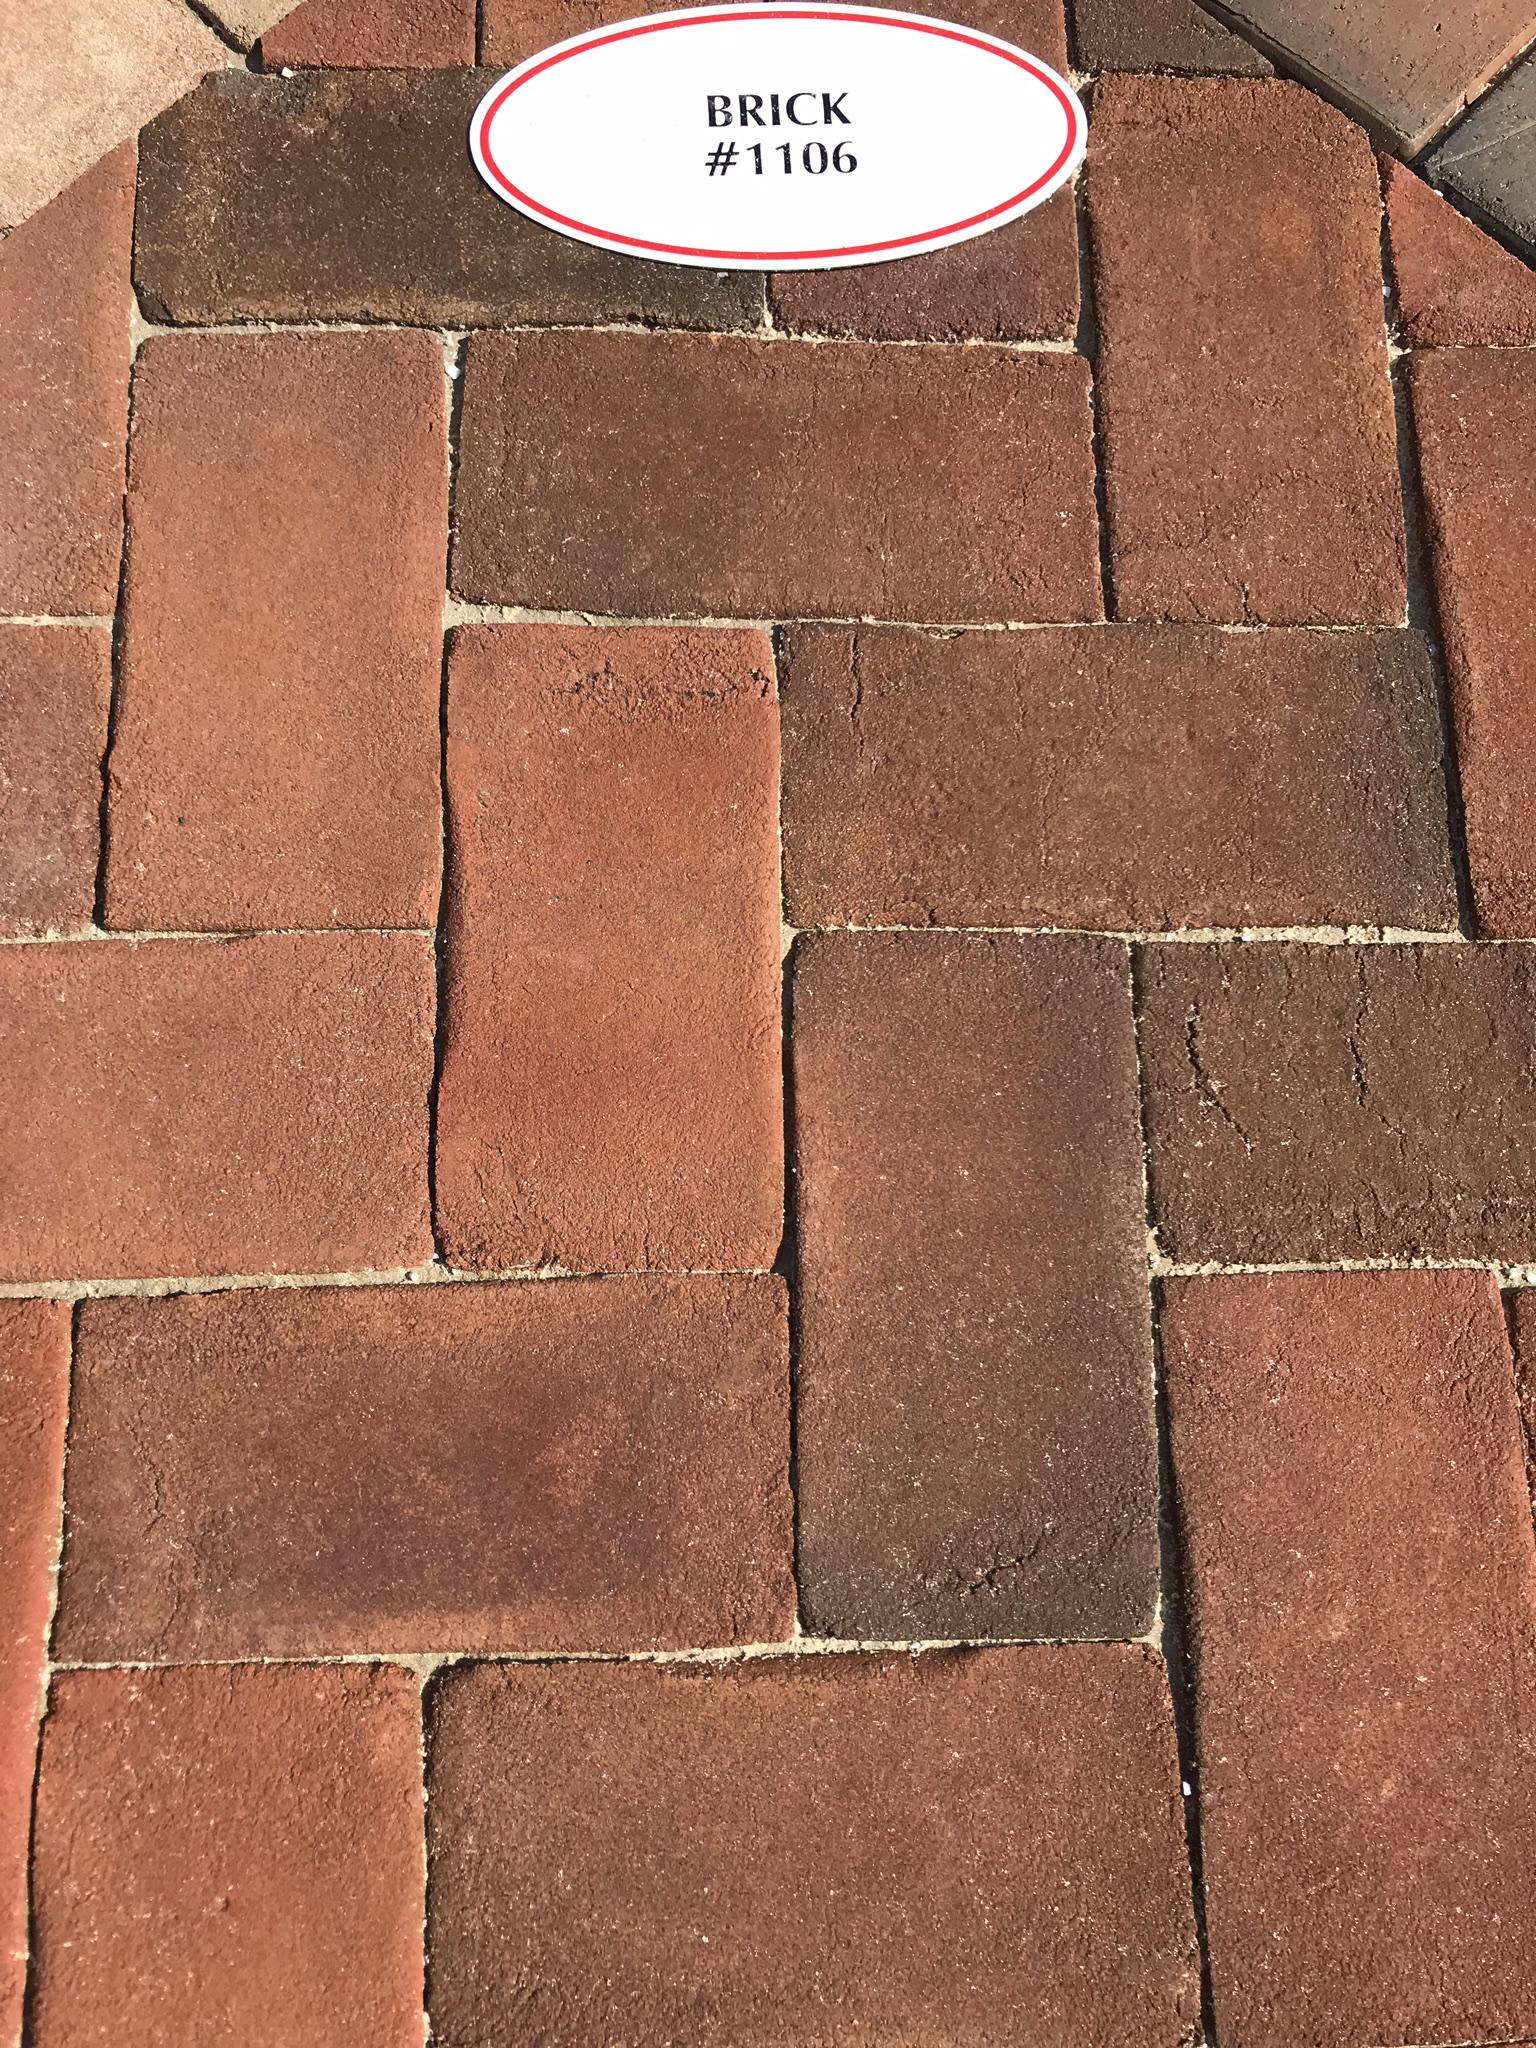 Brick #1106